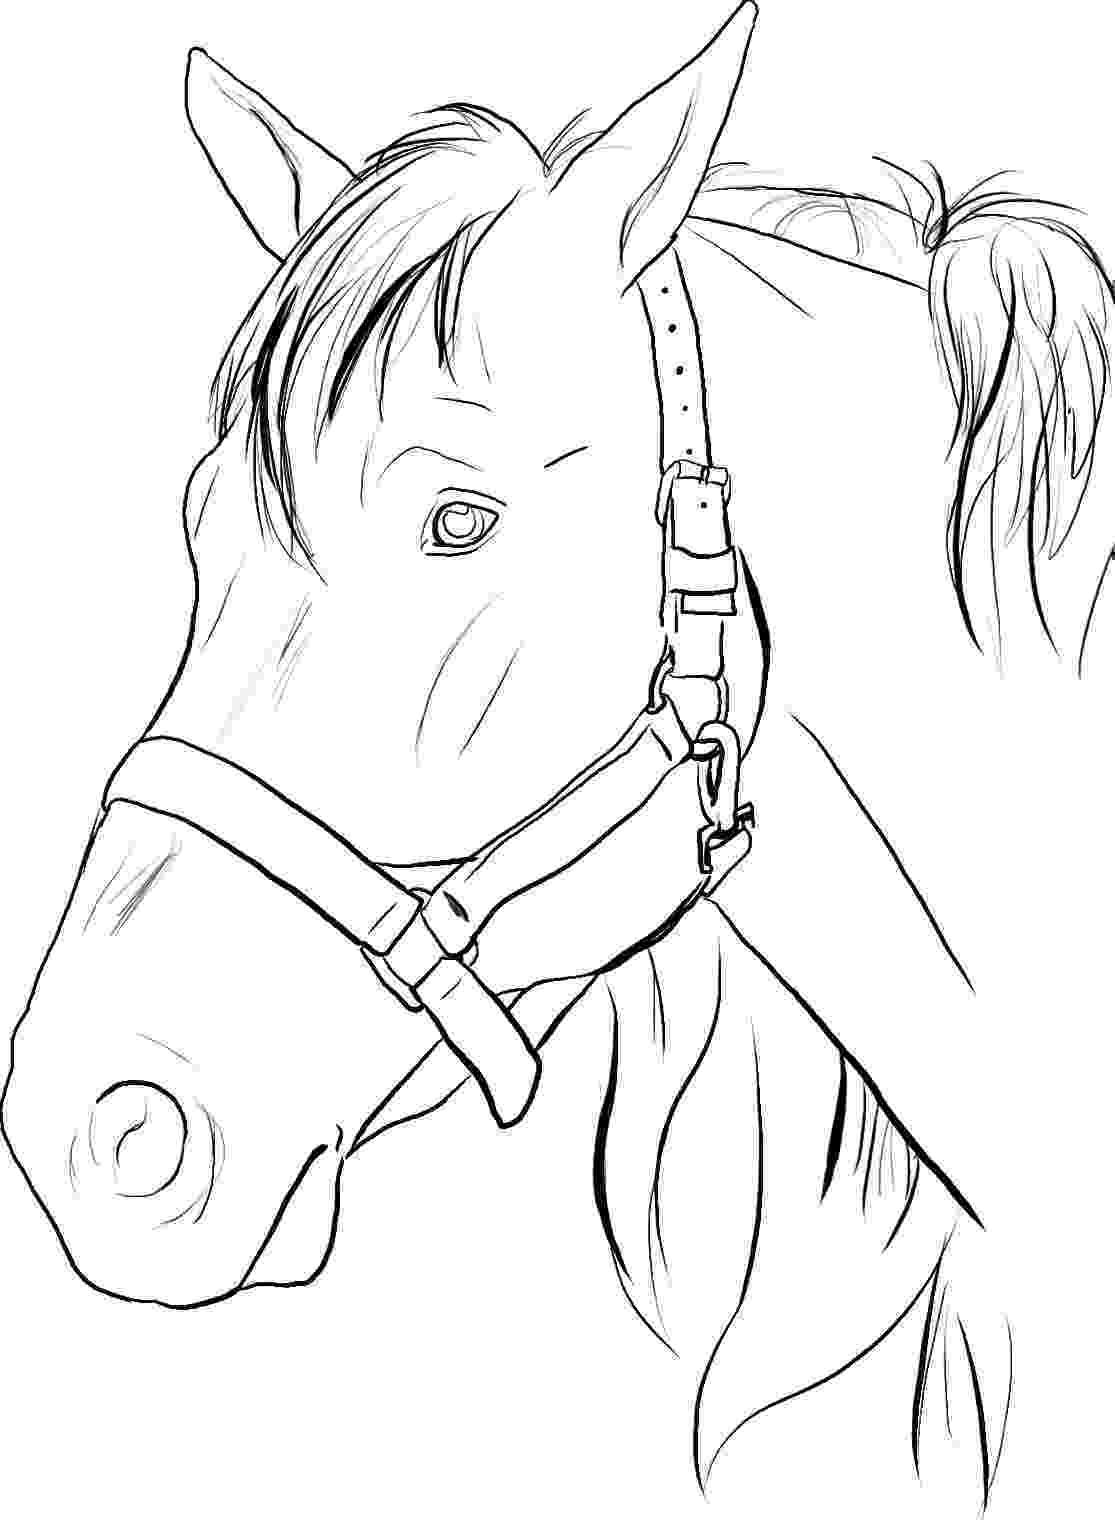 coloring pages horses horse coloring pages 1001 coloringpages animals coloring horses pages